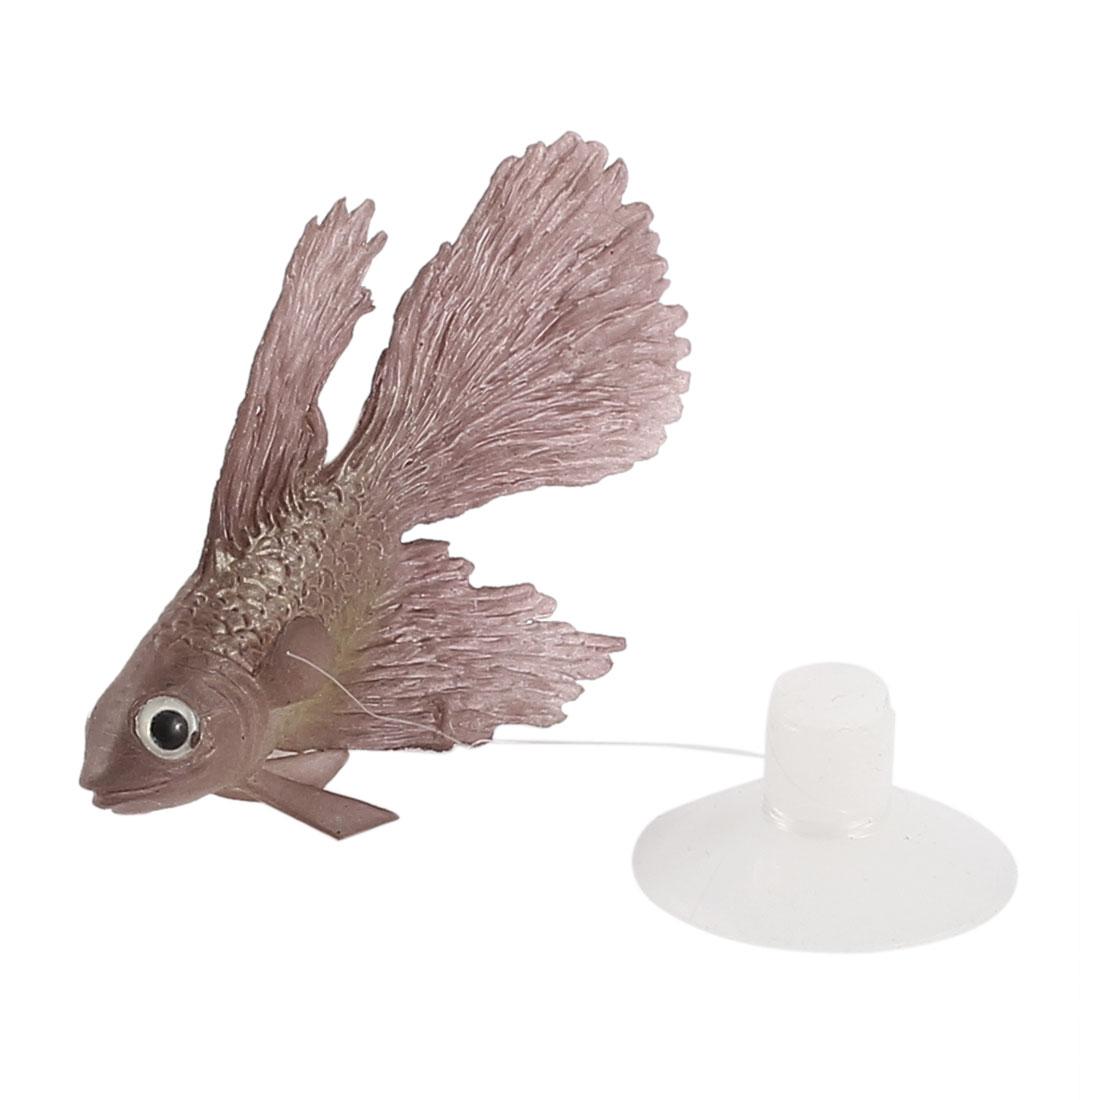 Aquarium Tank Imitative Floating Glowing Betta Fish Ornament Rosybrown